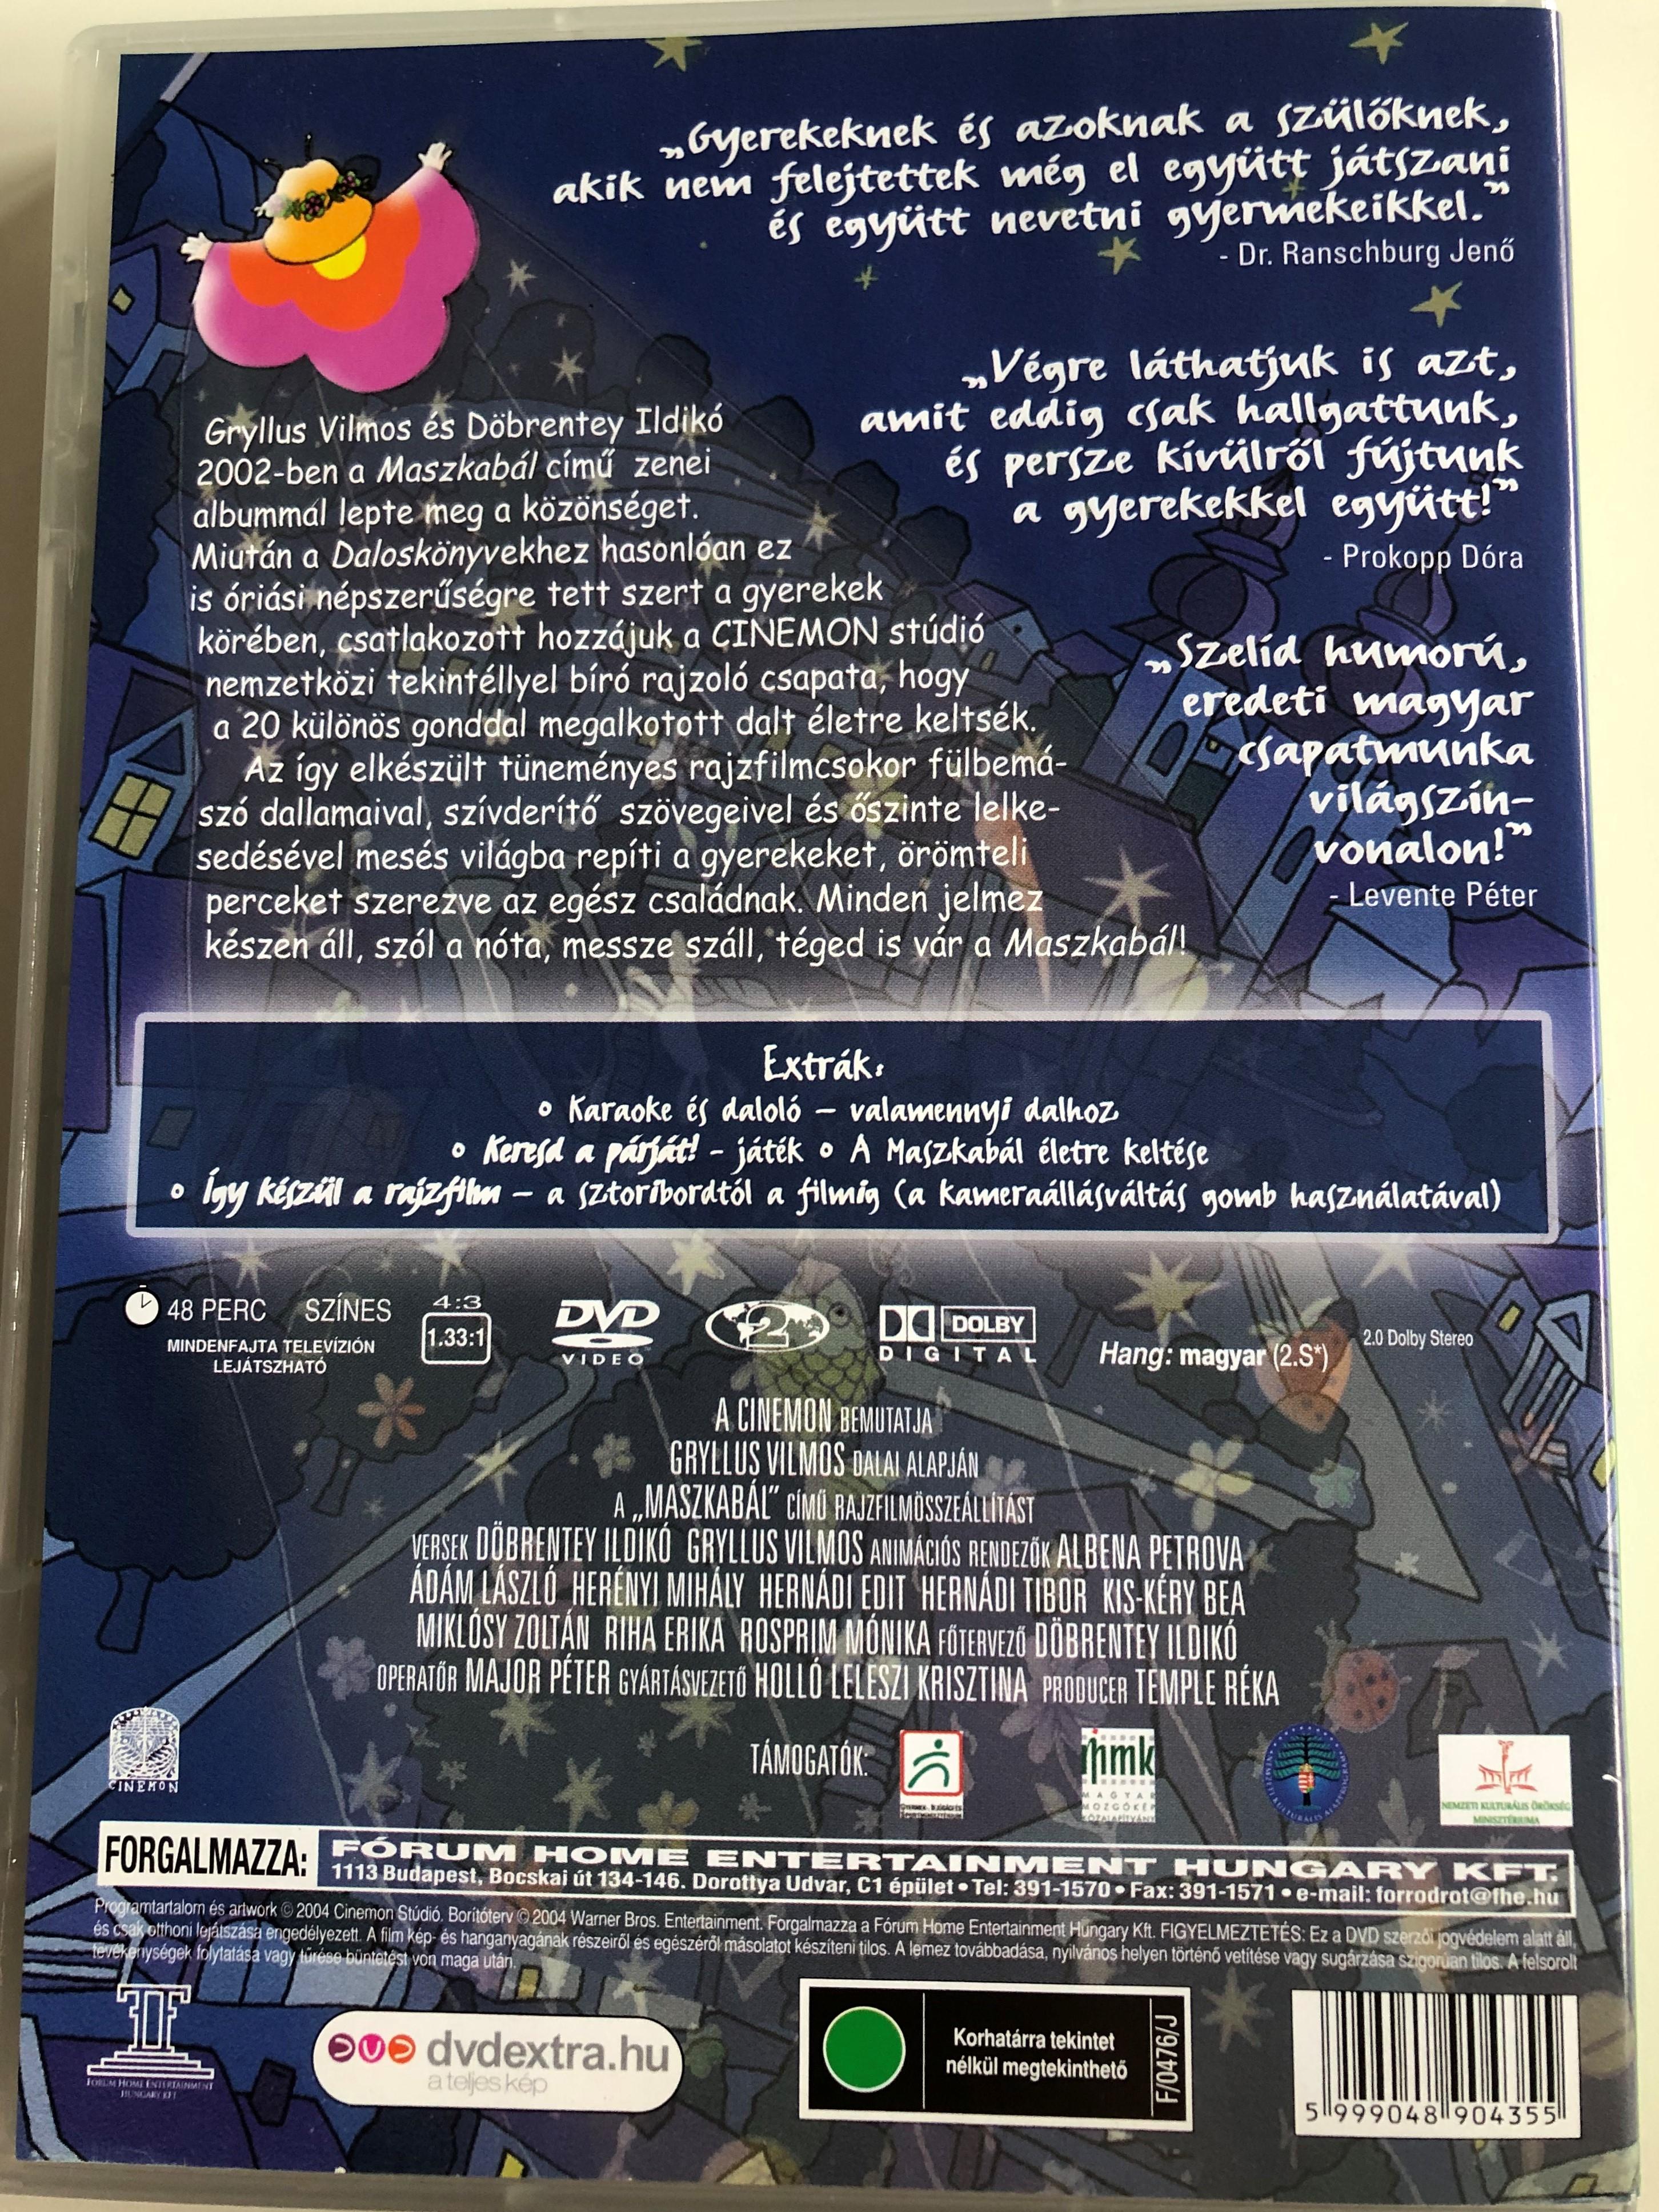 maszkab-l-dvd-2004-gryllus-vilmos-dalai-var-zslatos-letre-kelnek-4.jpg